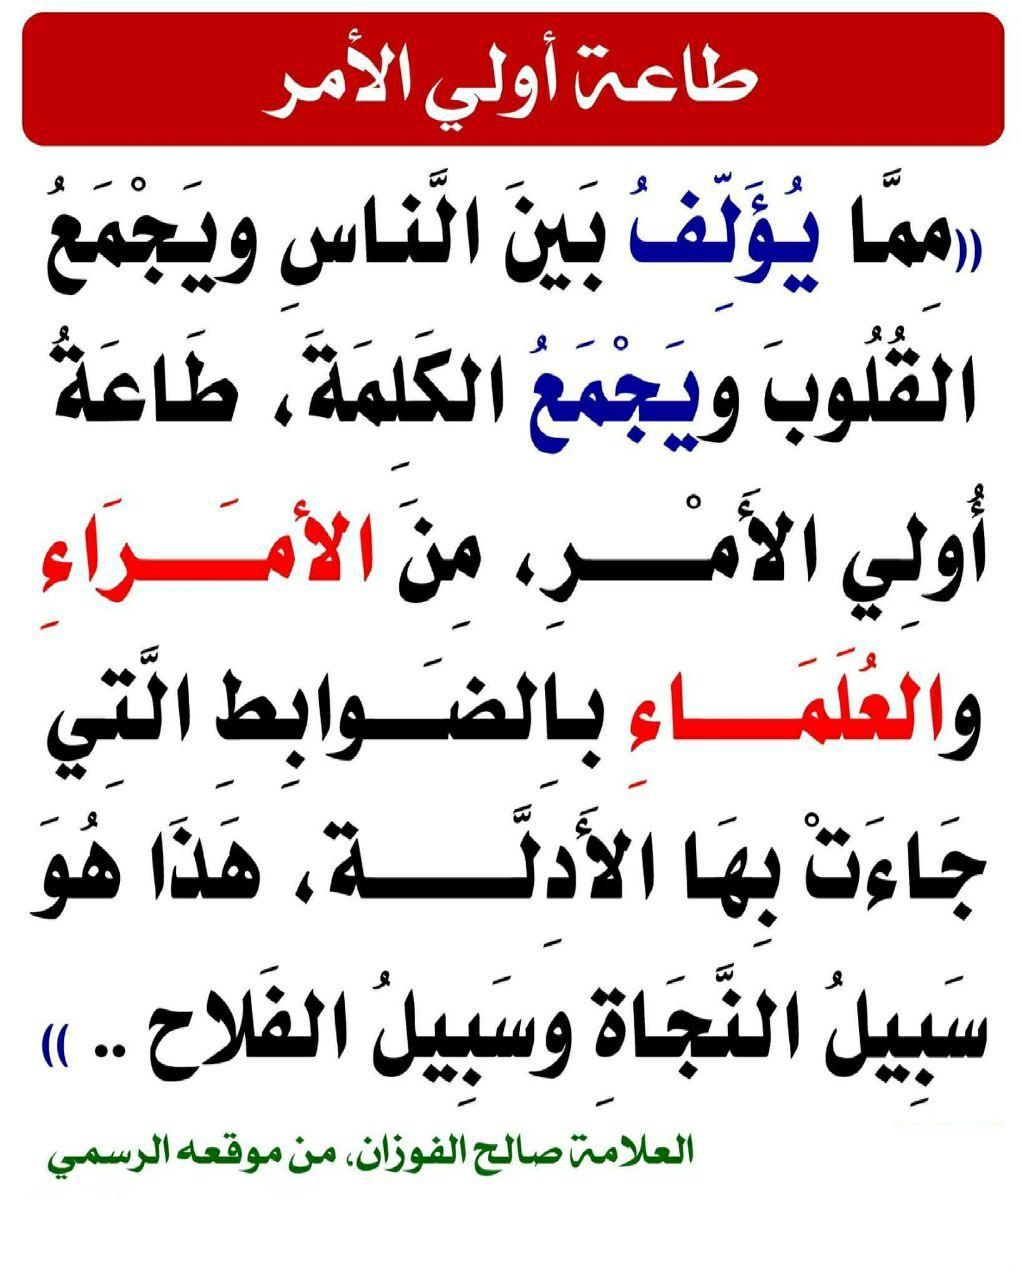 Pin By الأثر الجميل On أقوال الصحابة والعلماء Islamic Quotes Quotes Math